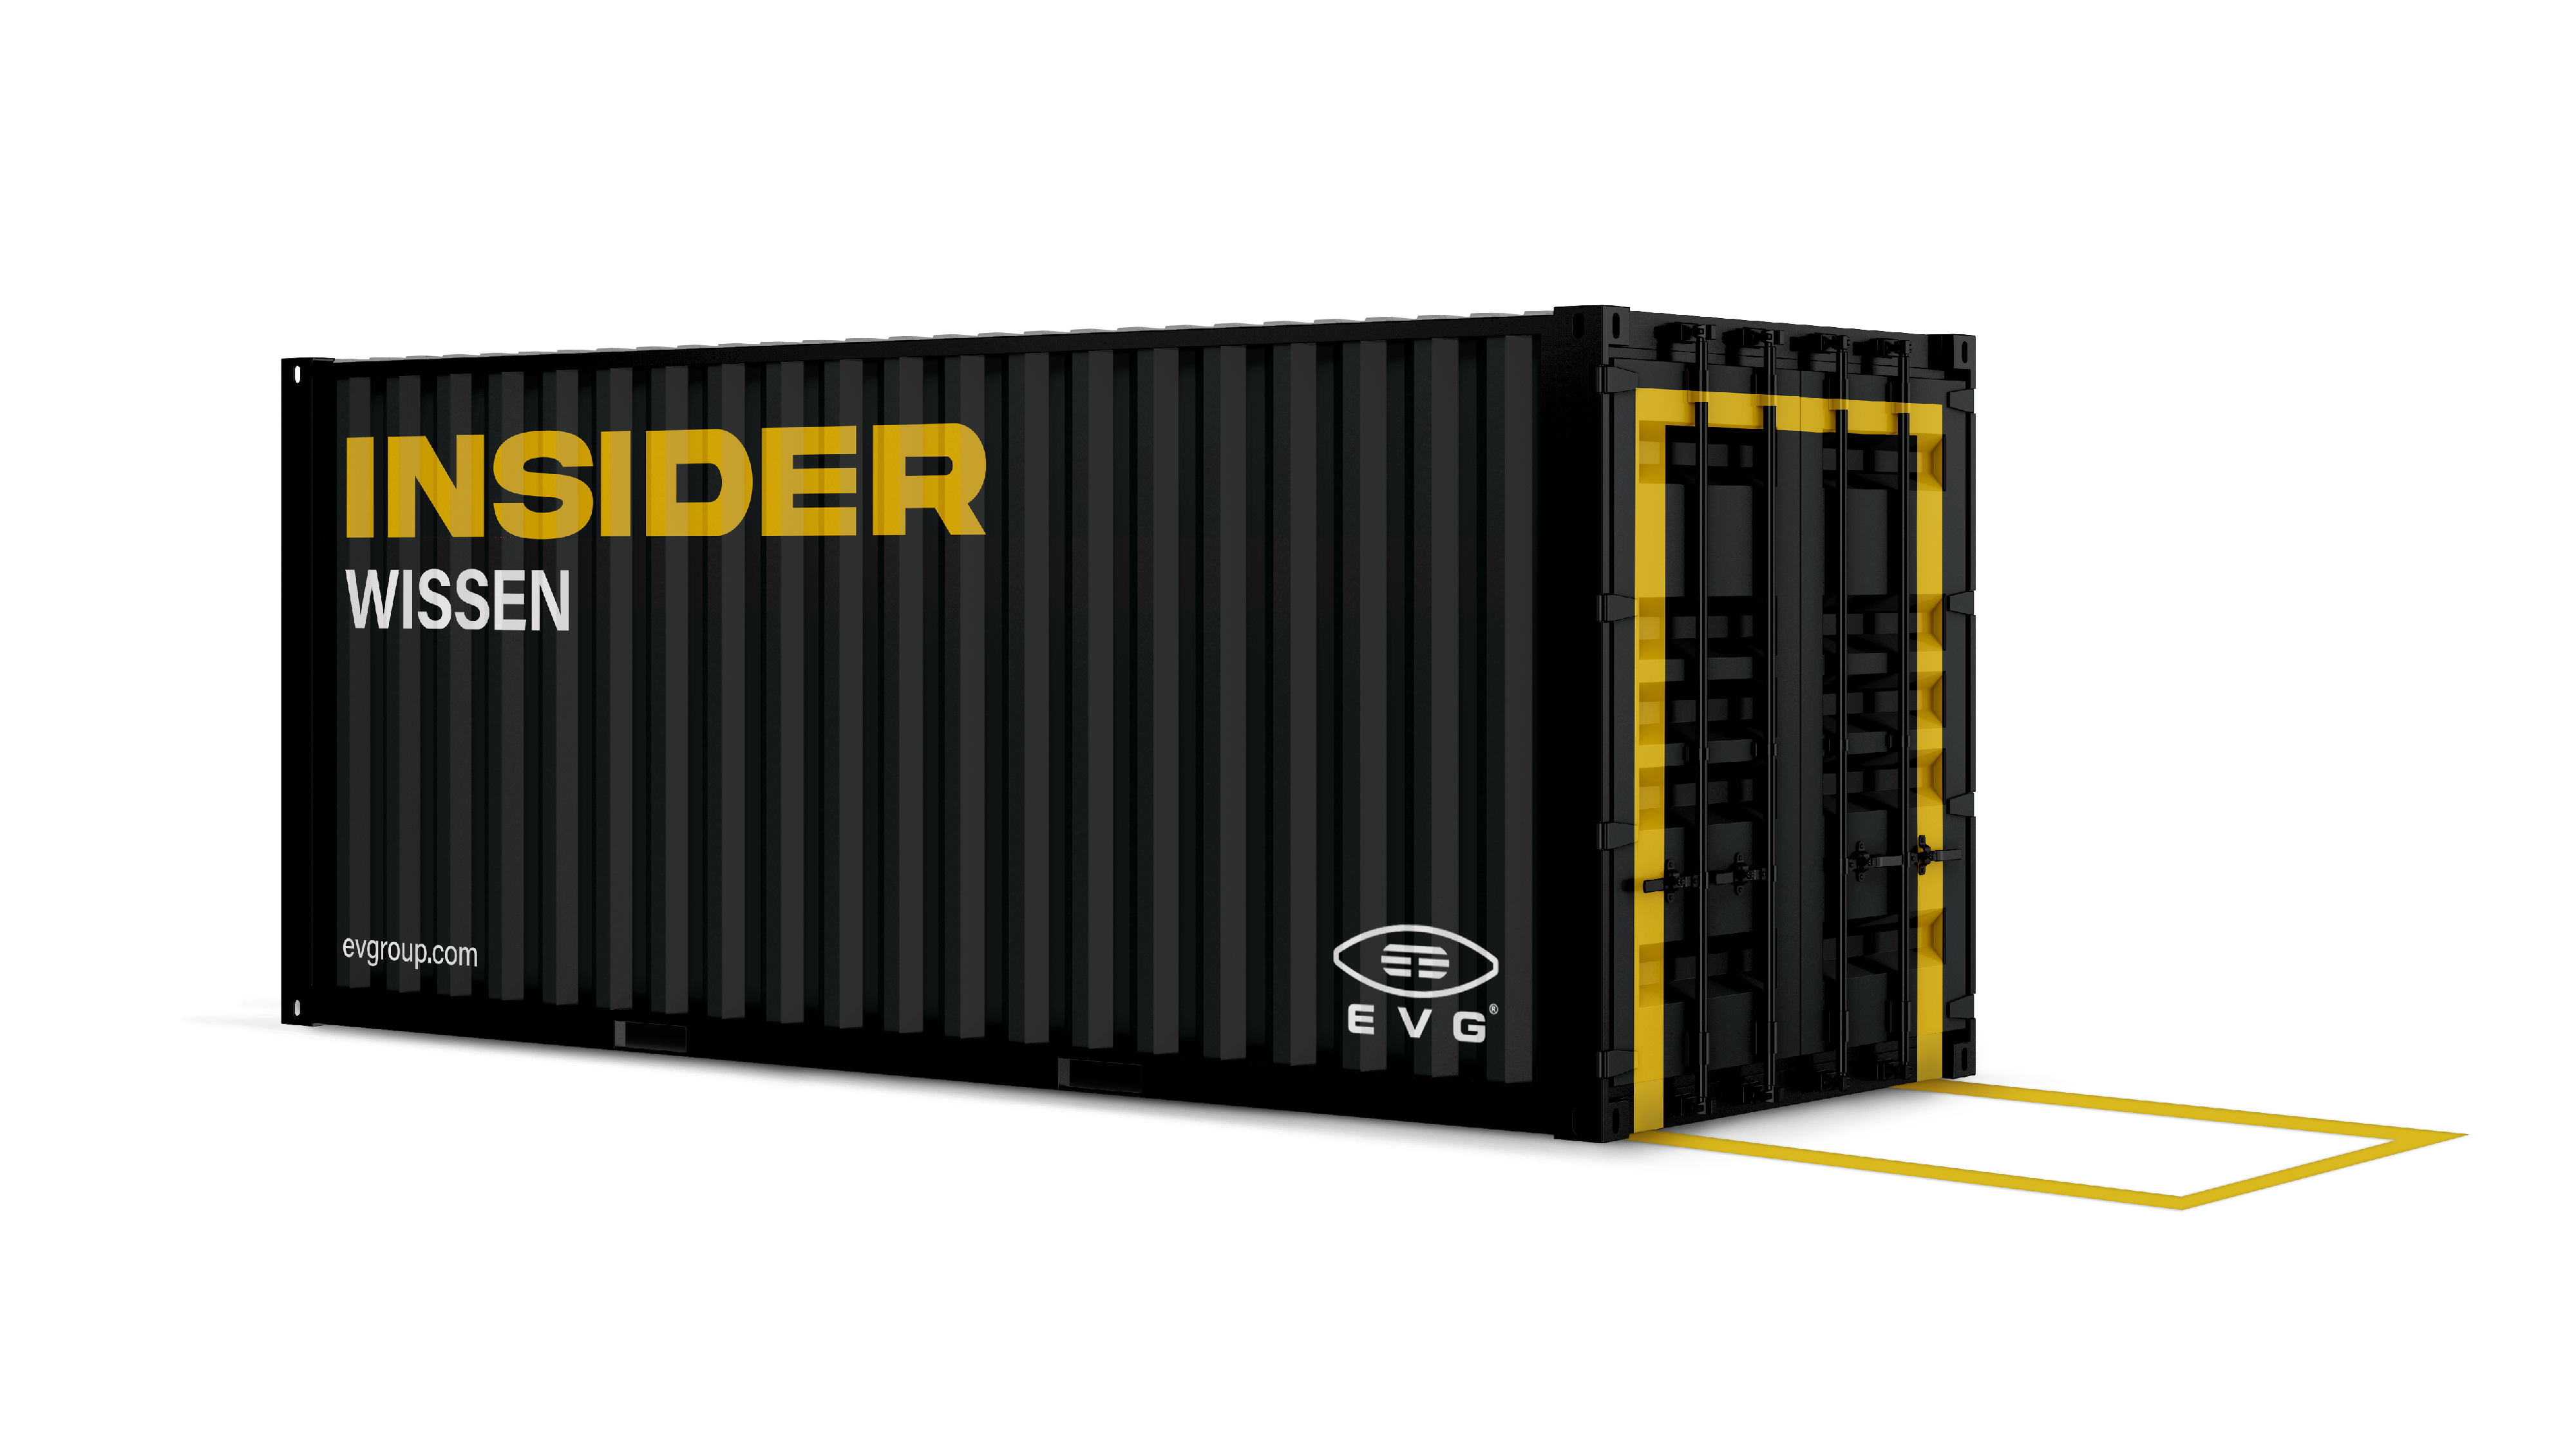 Ref EVG 12 Container